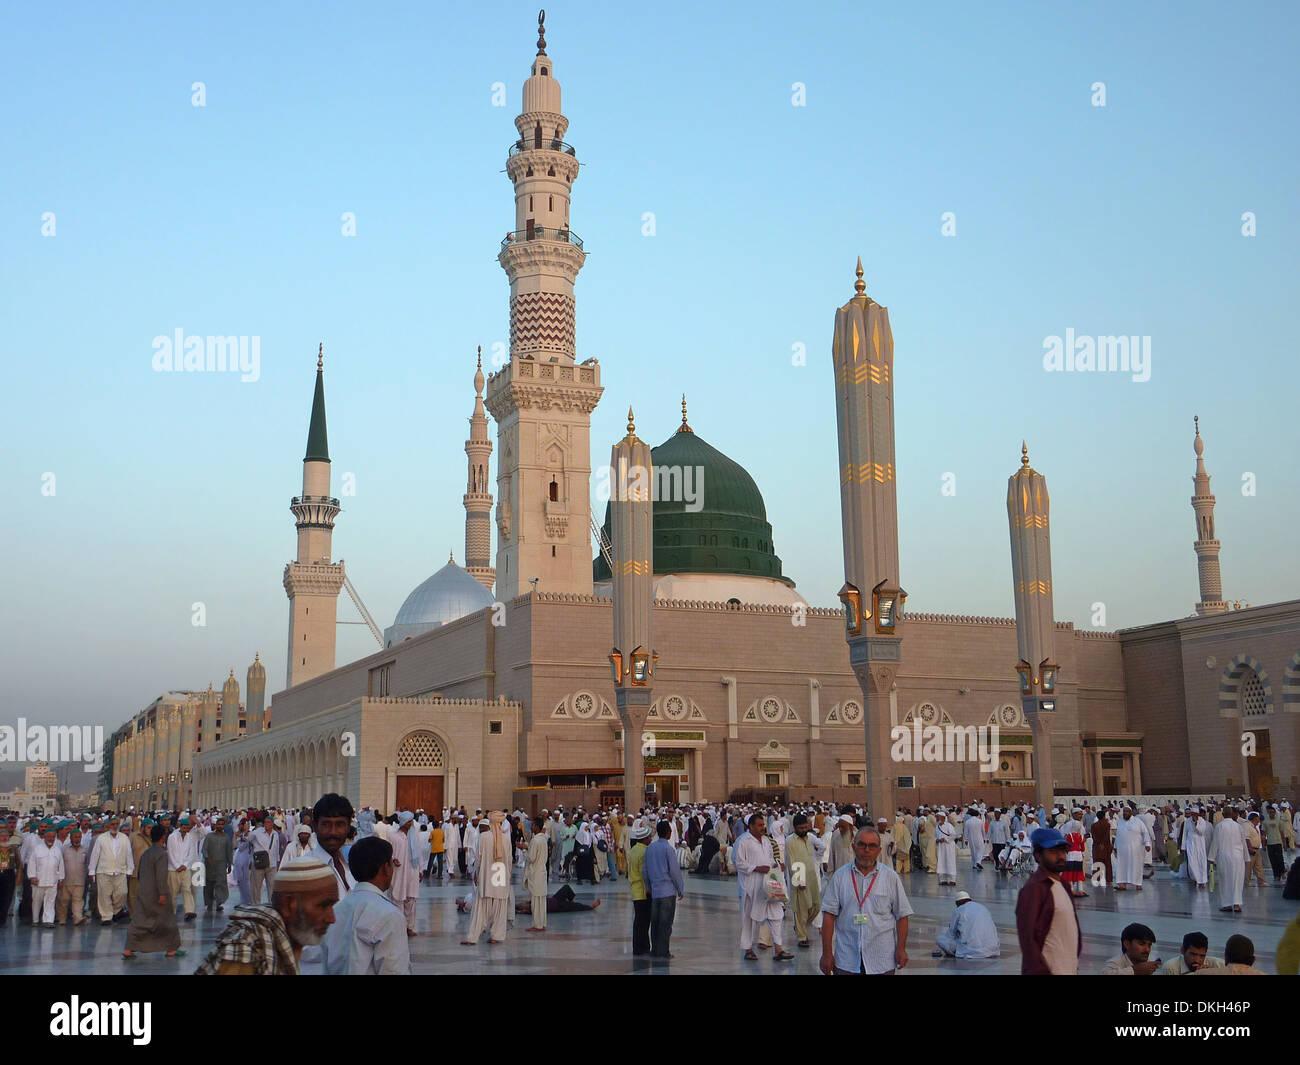 Muslims gathered for worship Nabawi Mosque, Medina, Saudi Arabia - Stock Image